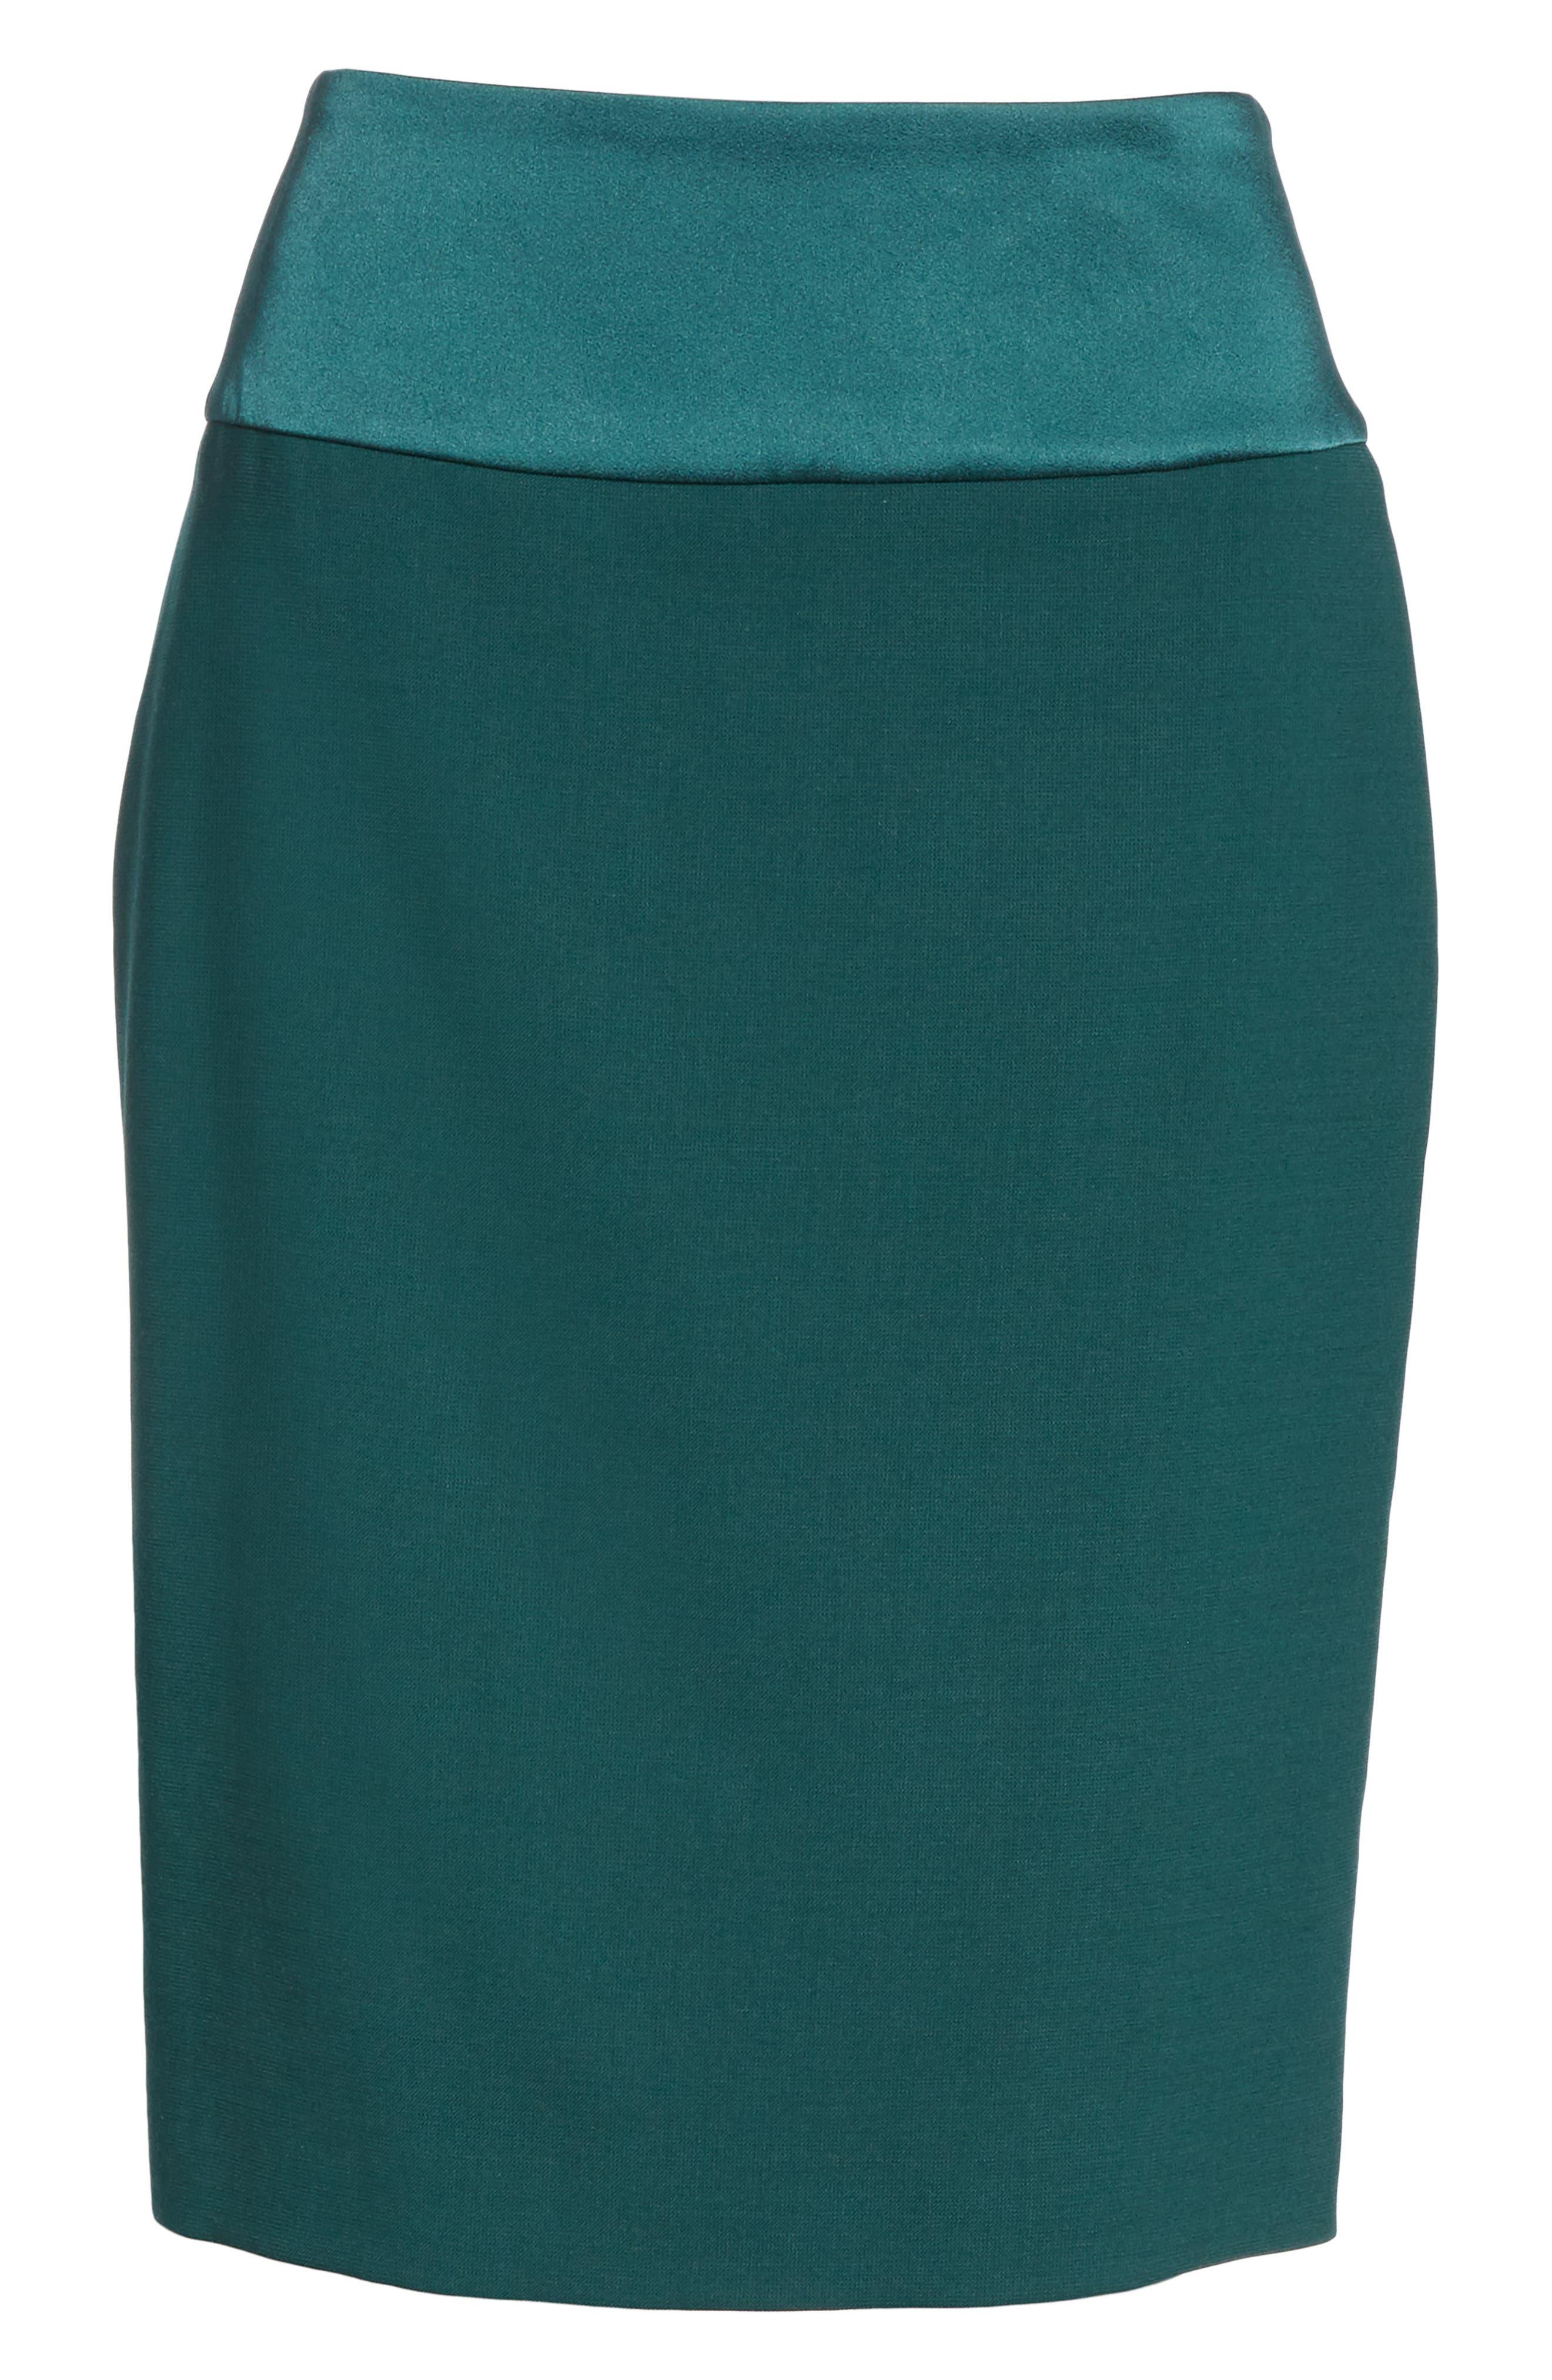 Vanufa Stretch Wool Suit Skirt,                             Alternate thumbnail 6, color,                             PINE GREEN